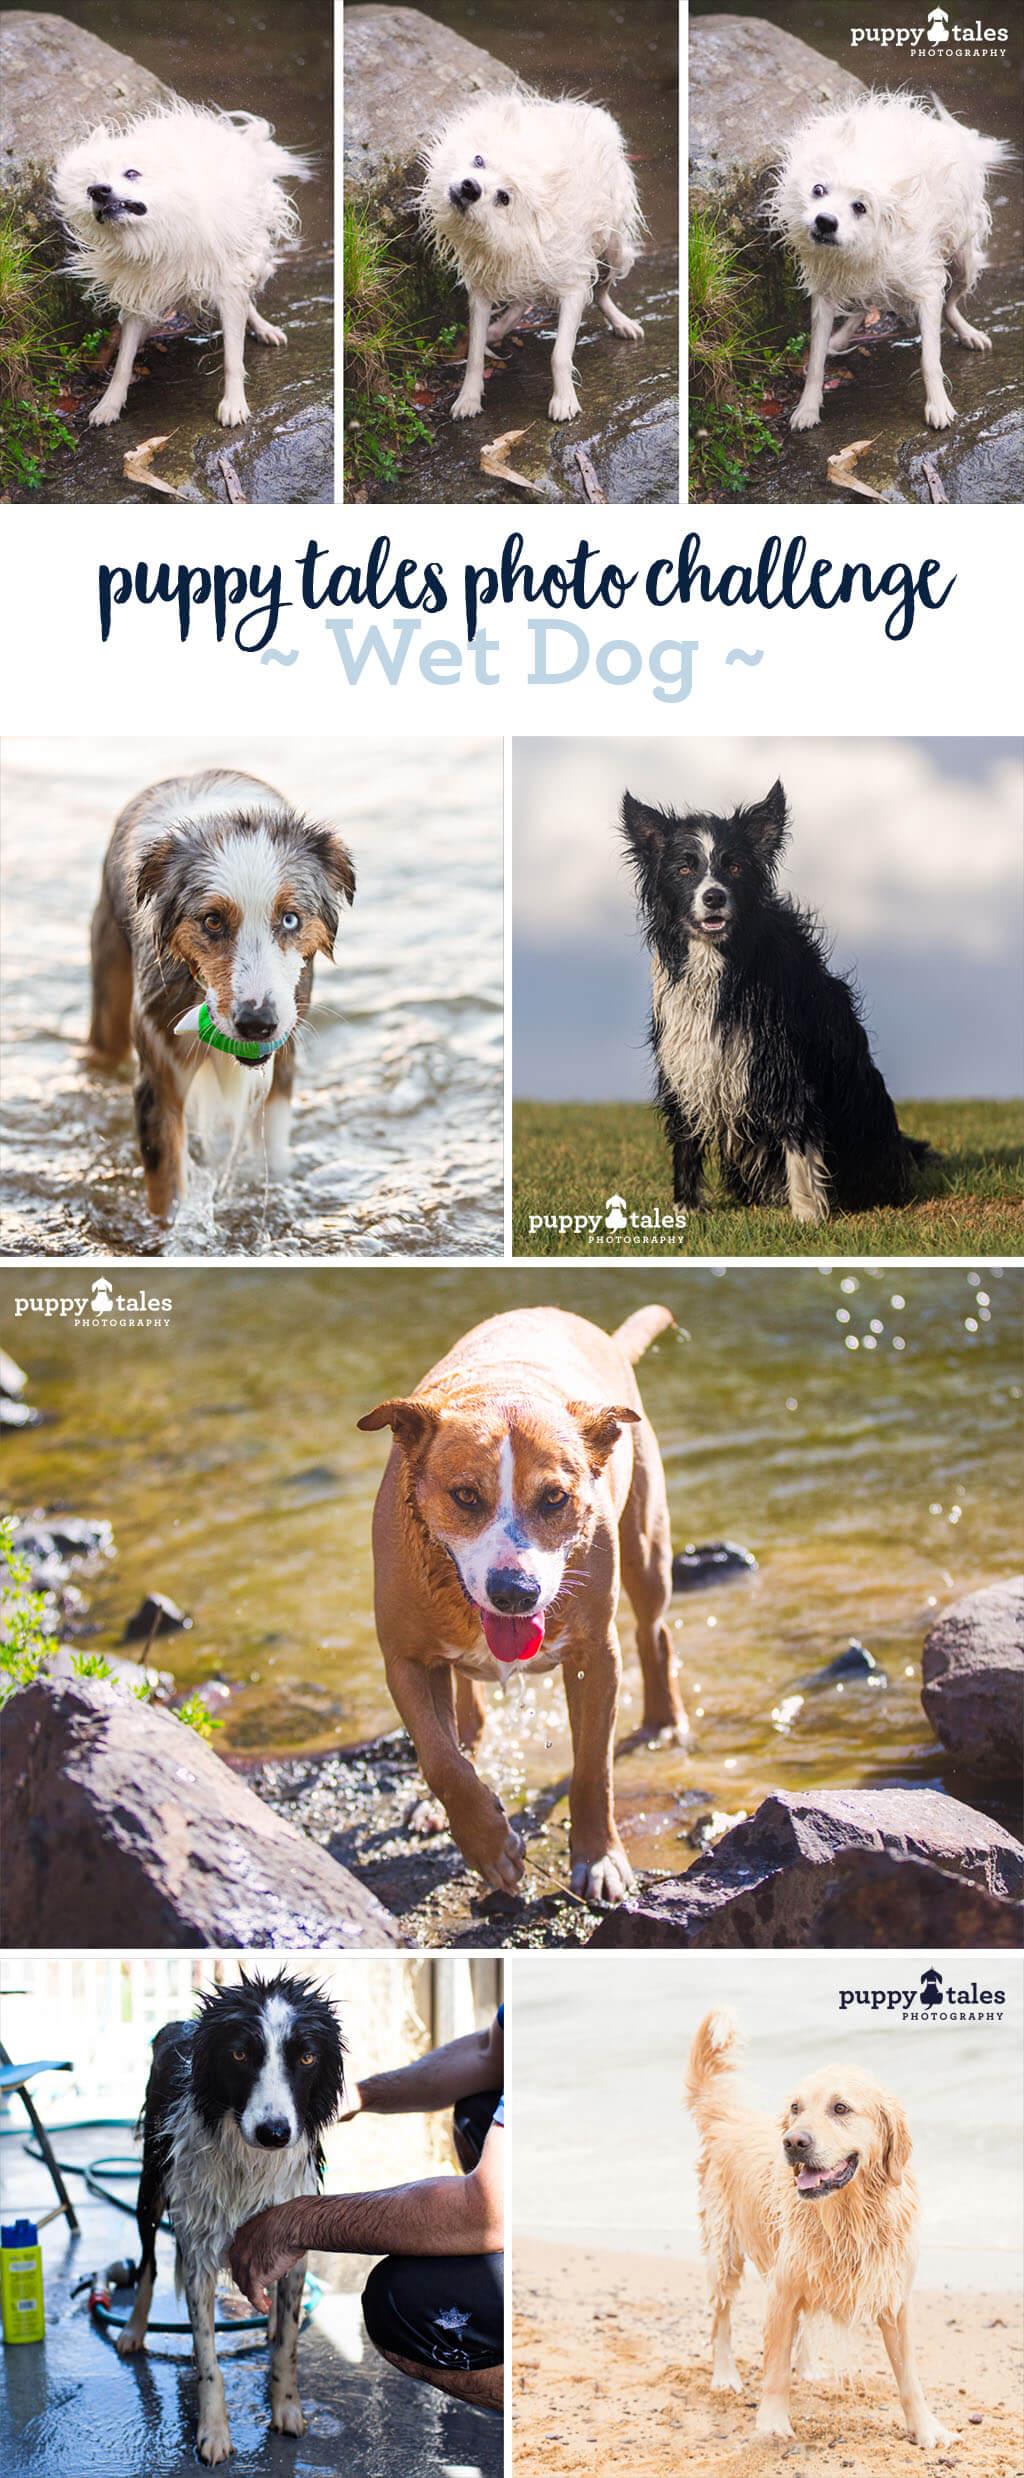 Photo Challenge - Wet Dog